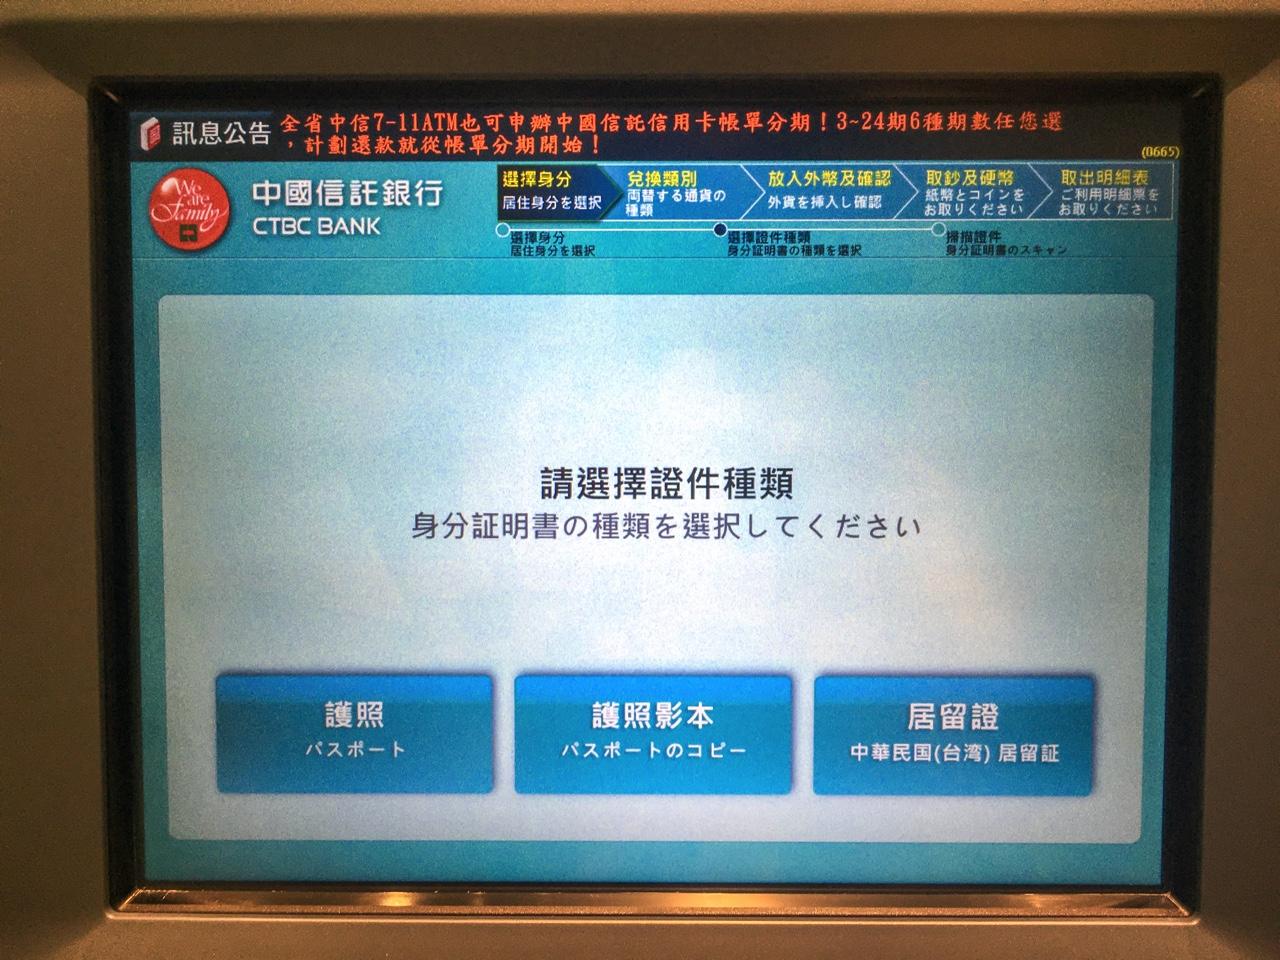 自動外貨両替機の画面03